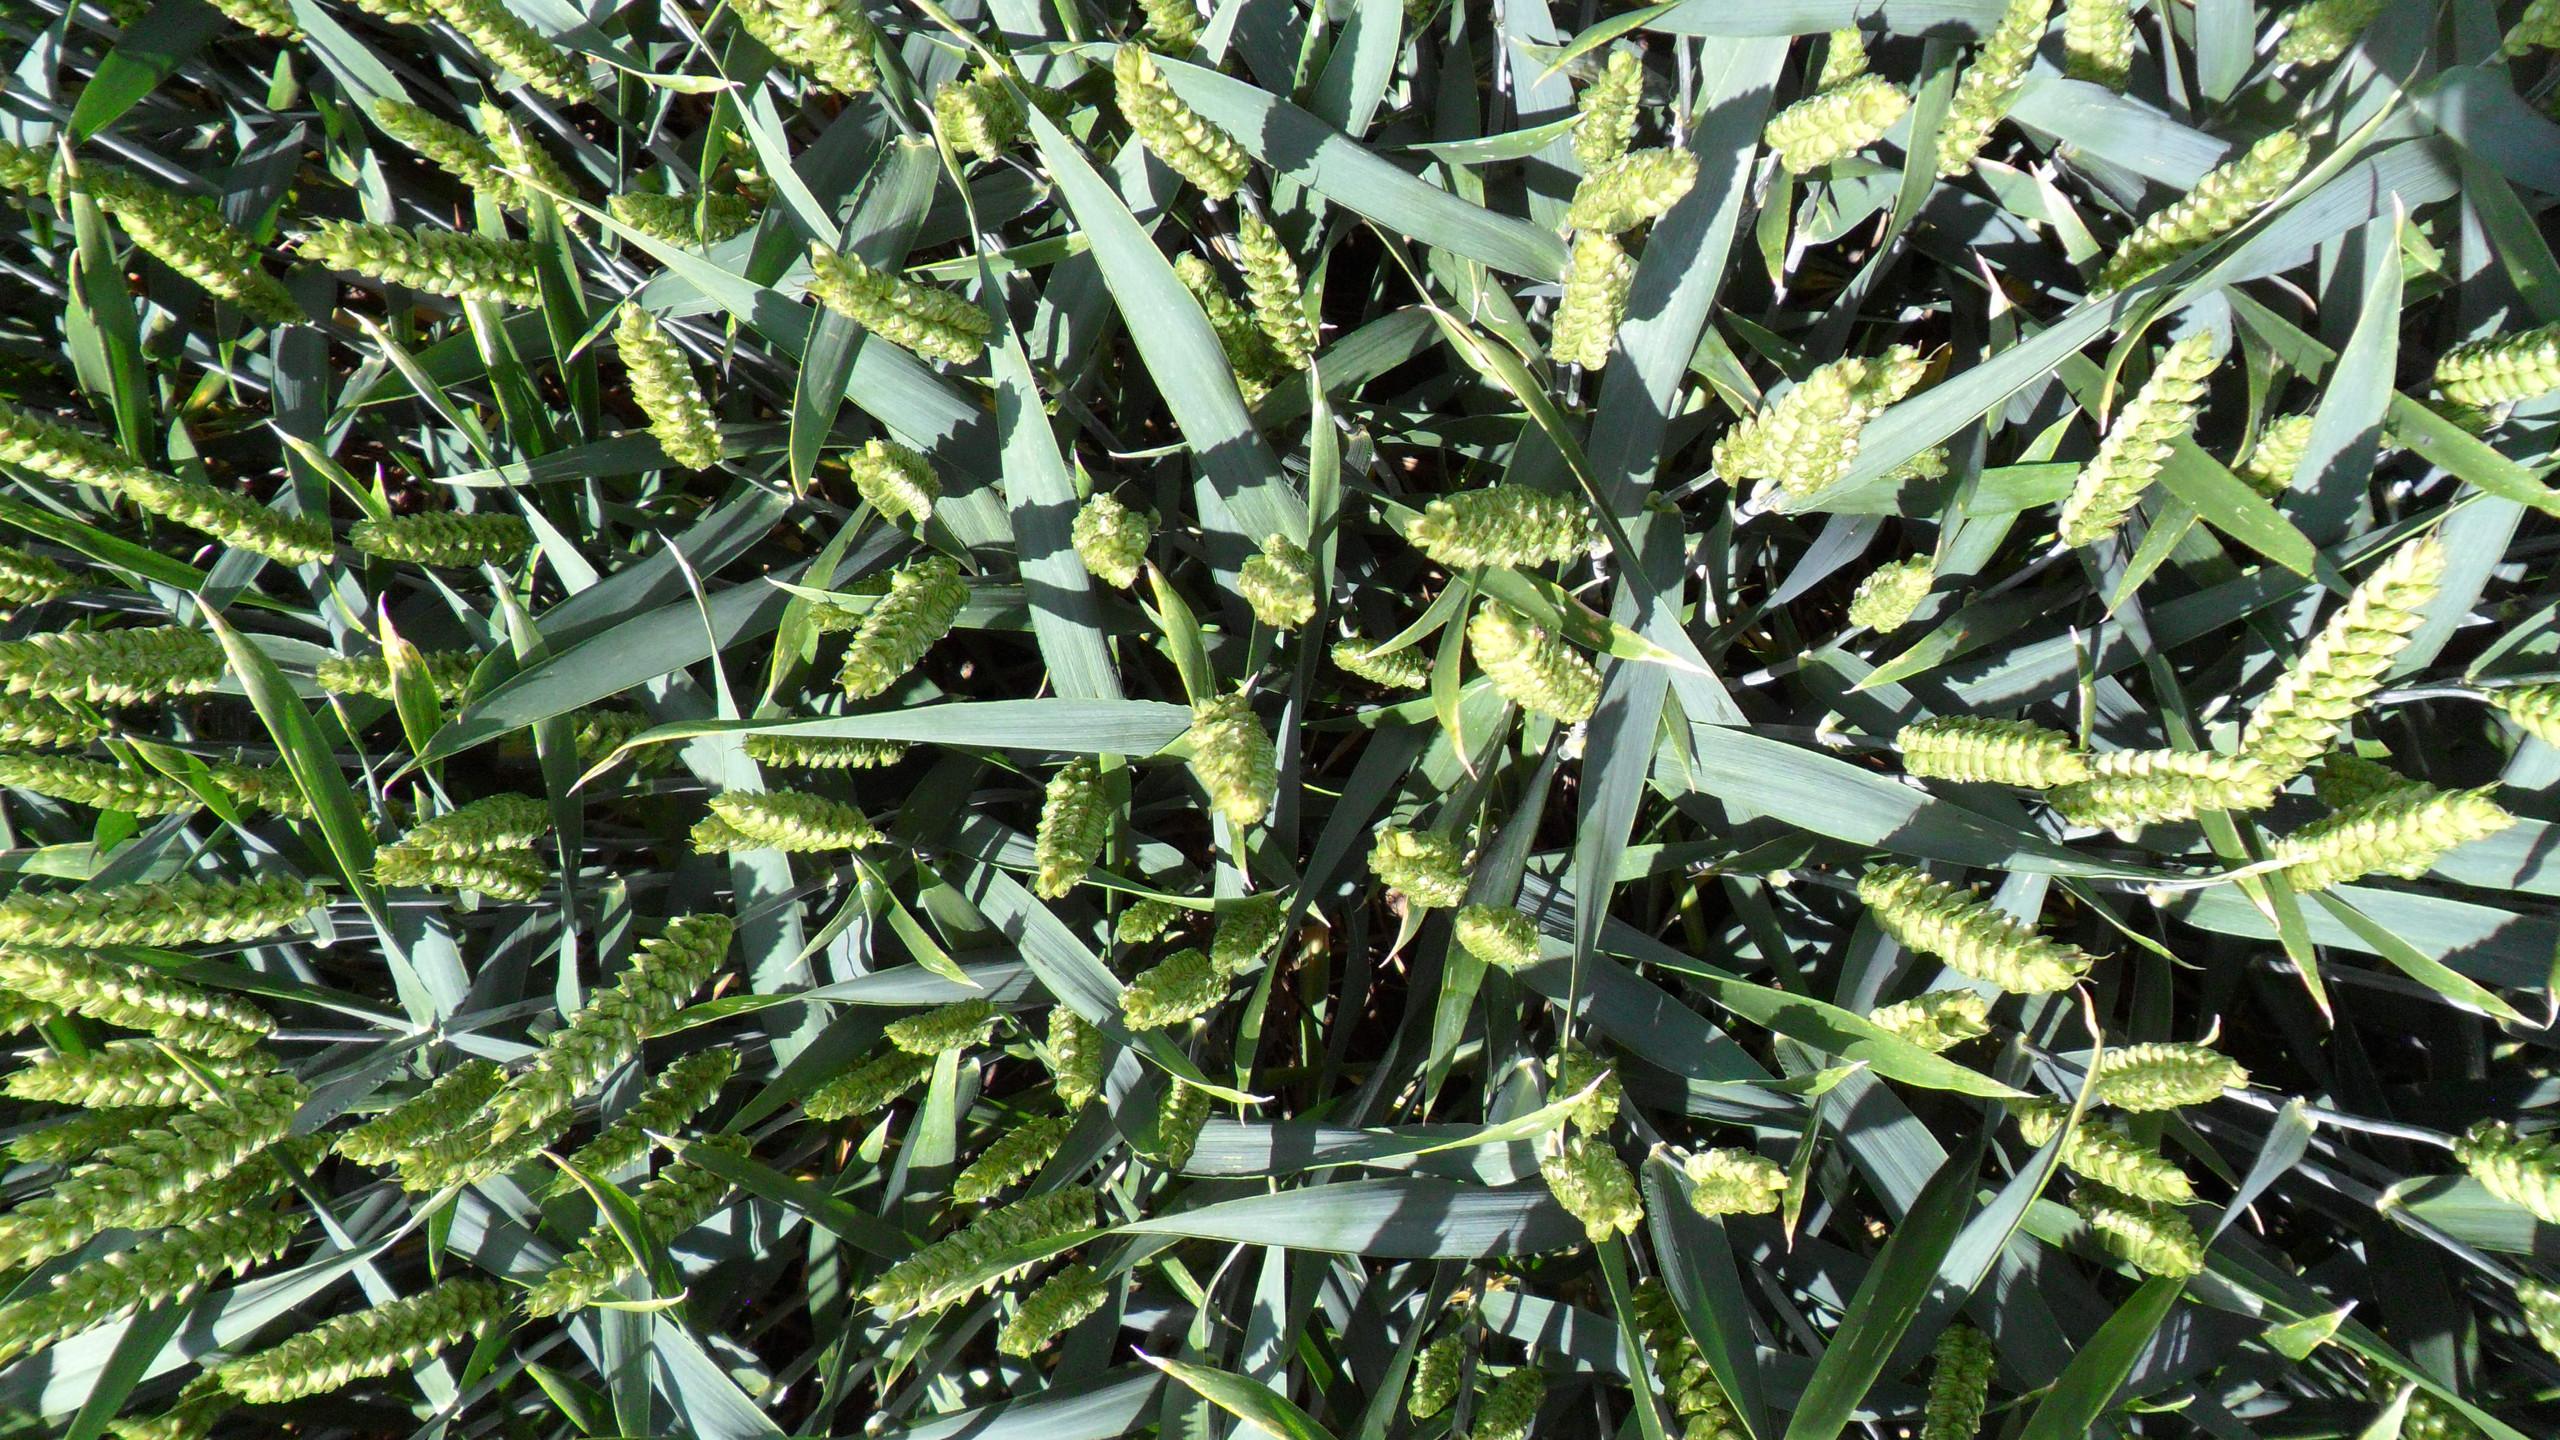 Winter Wheat Disease free